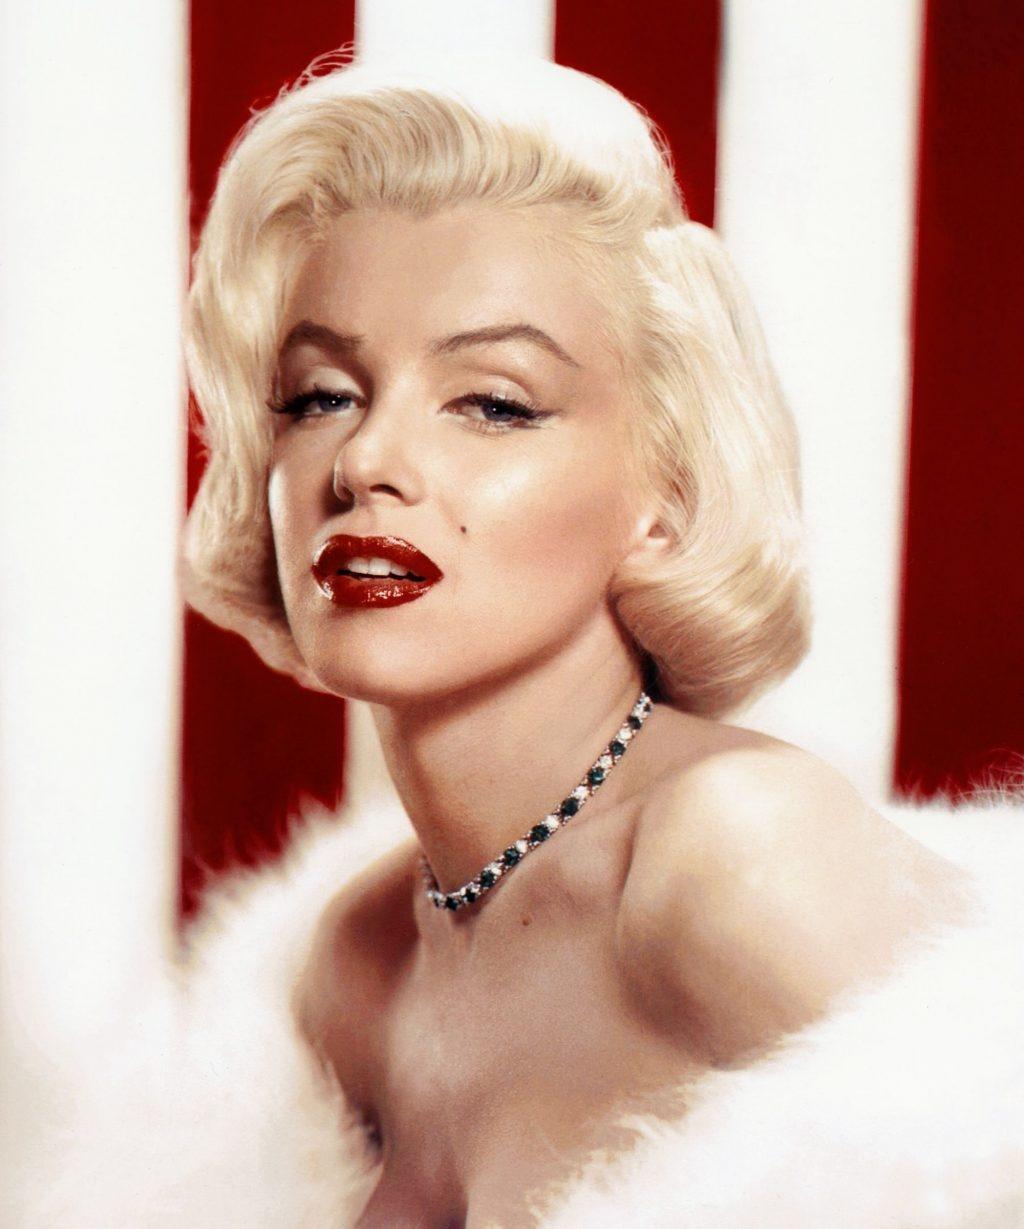 bieu tuong nhan sac Marilyn Monroe anh 4